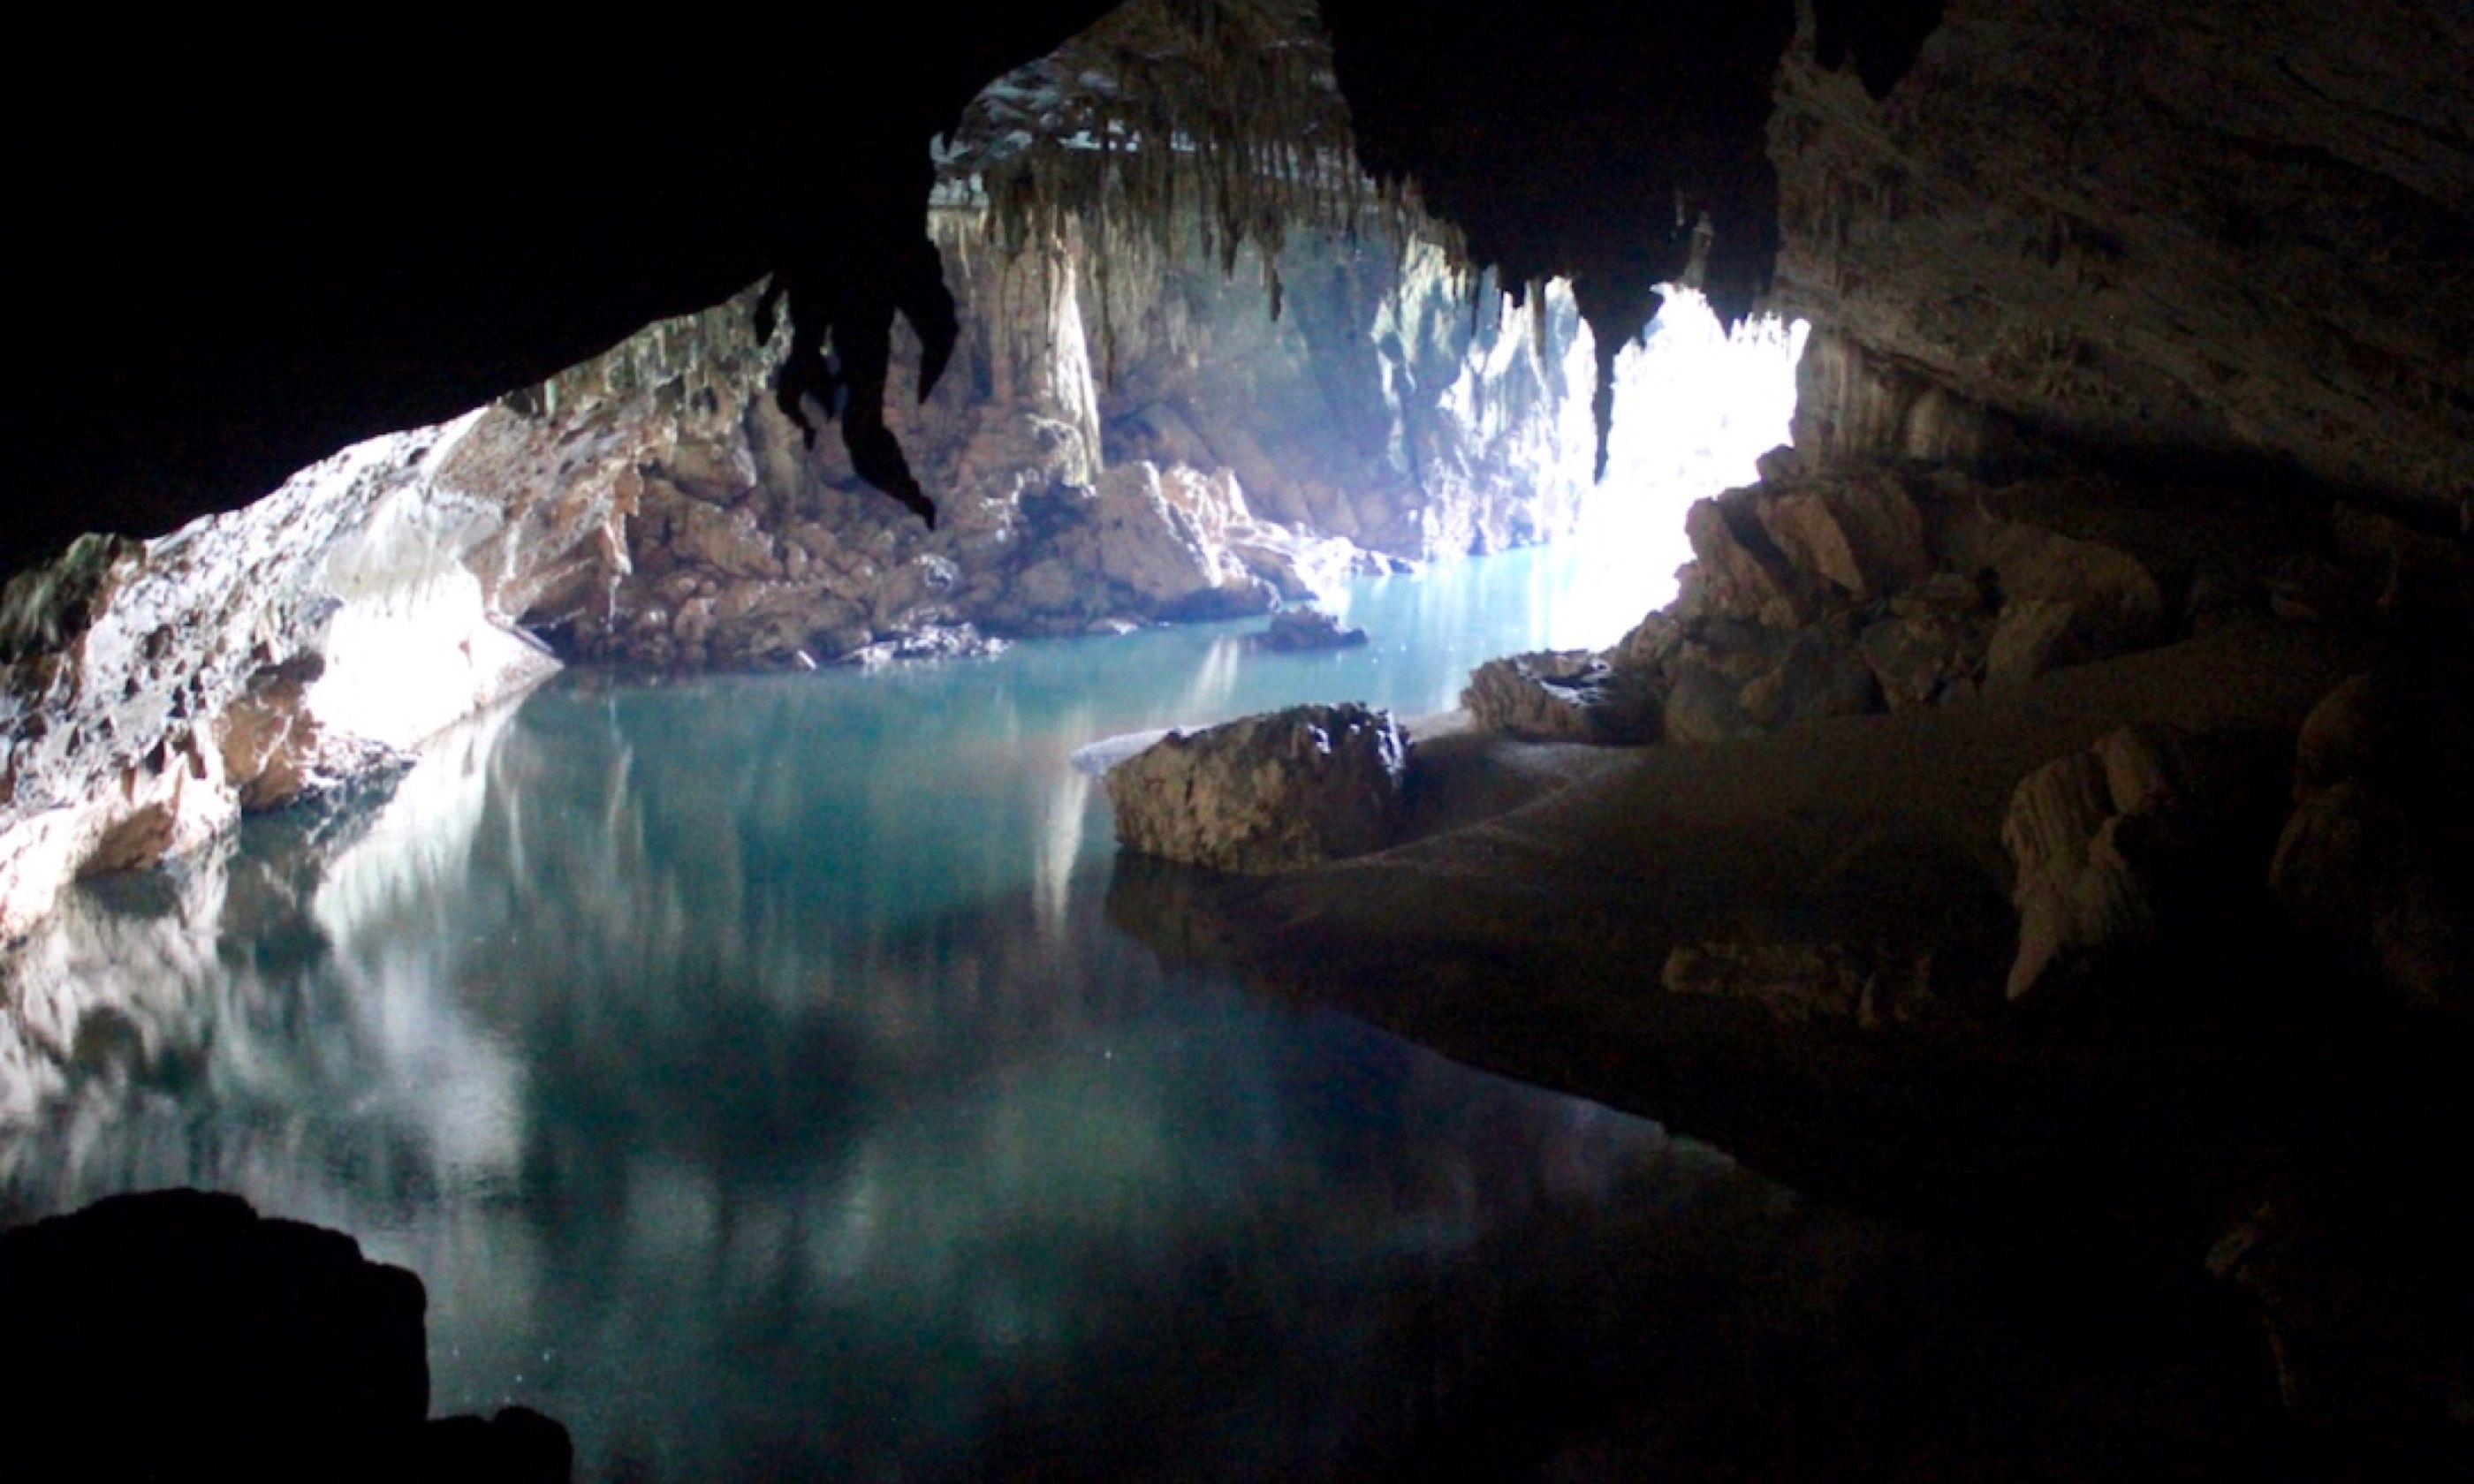 The entrance to the Xe Bang Far River caves (Mark Steadman)